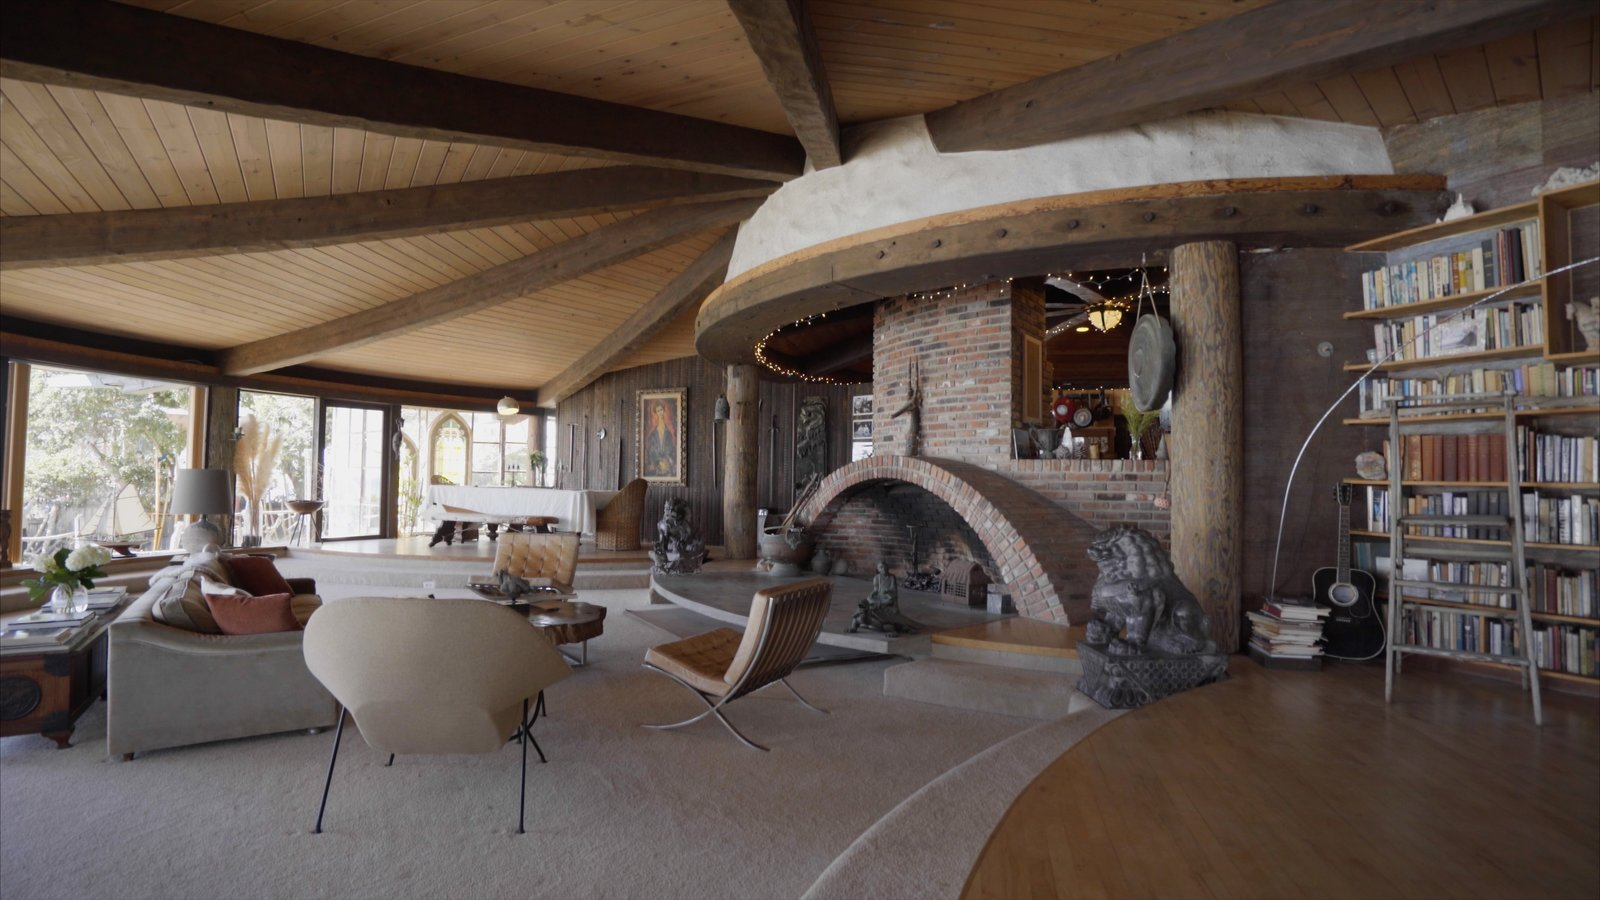 Living Room, Medium Hardwood Floor, and Wood Burning Fireplace #harrygesner #sandcastle #iconichouses  Video still courtesy of Jamie Leilani Pelayo  Photo 2 of 10 in 10 Modern Iconic Masterpieces